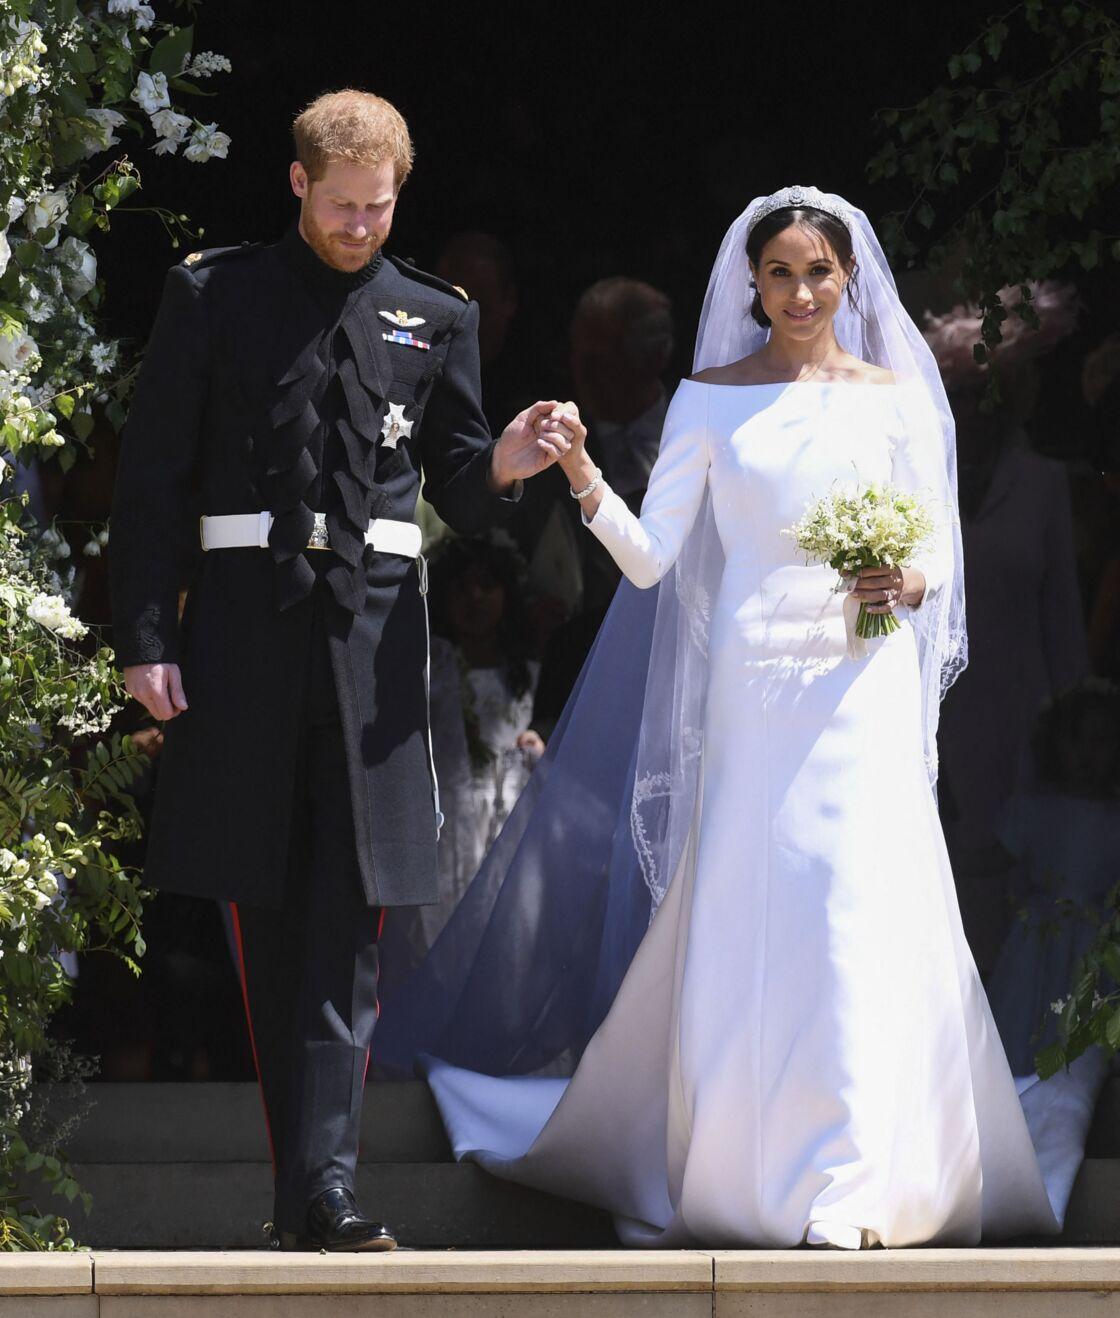 Meghan Markle dans sa superbe robe Givenchy à 350 000 dollars, le 19 mai 2018